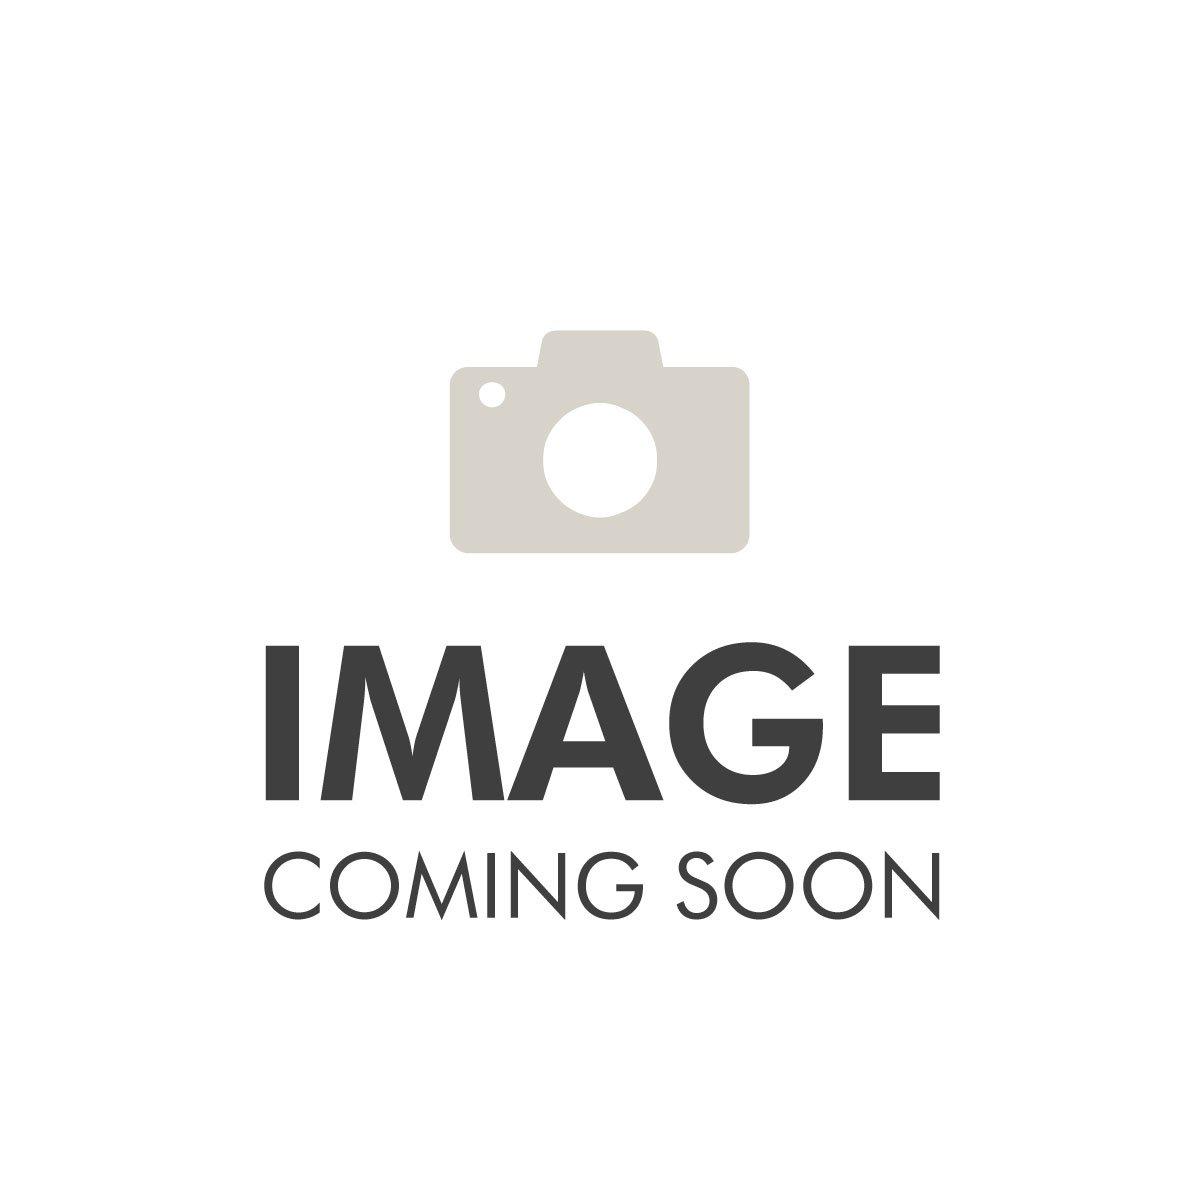 L'Oreal Loreal Studio Line Indestructible Extrem Hold Gel 150ml